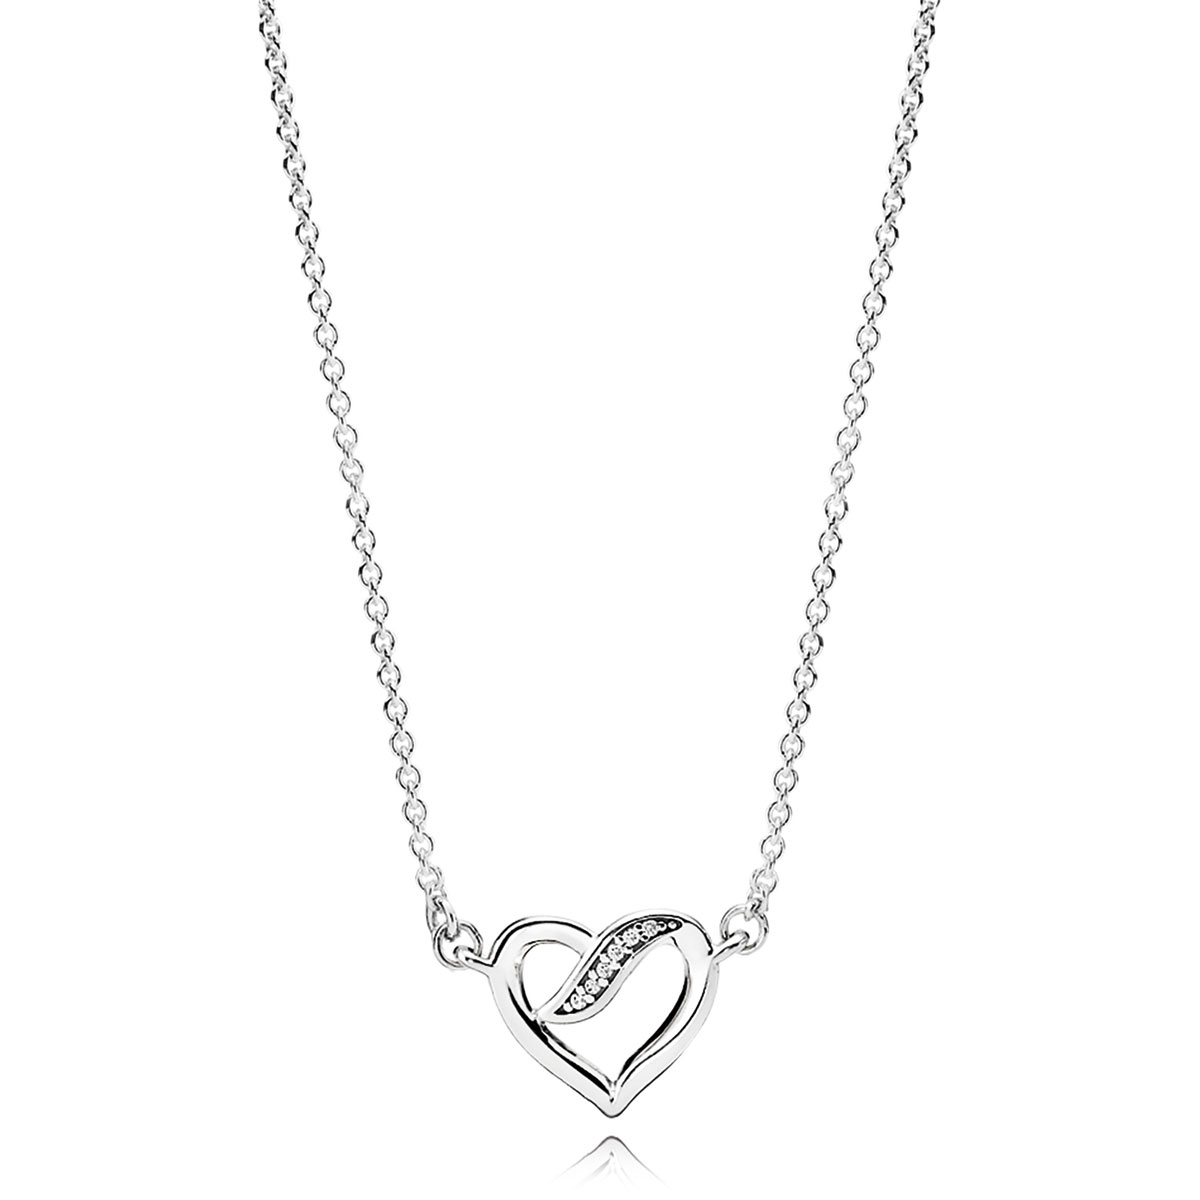 Pandora necklaces pancharmbracelets pandora ribbons of love clear cz necklace mozeypictures Image collections